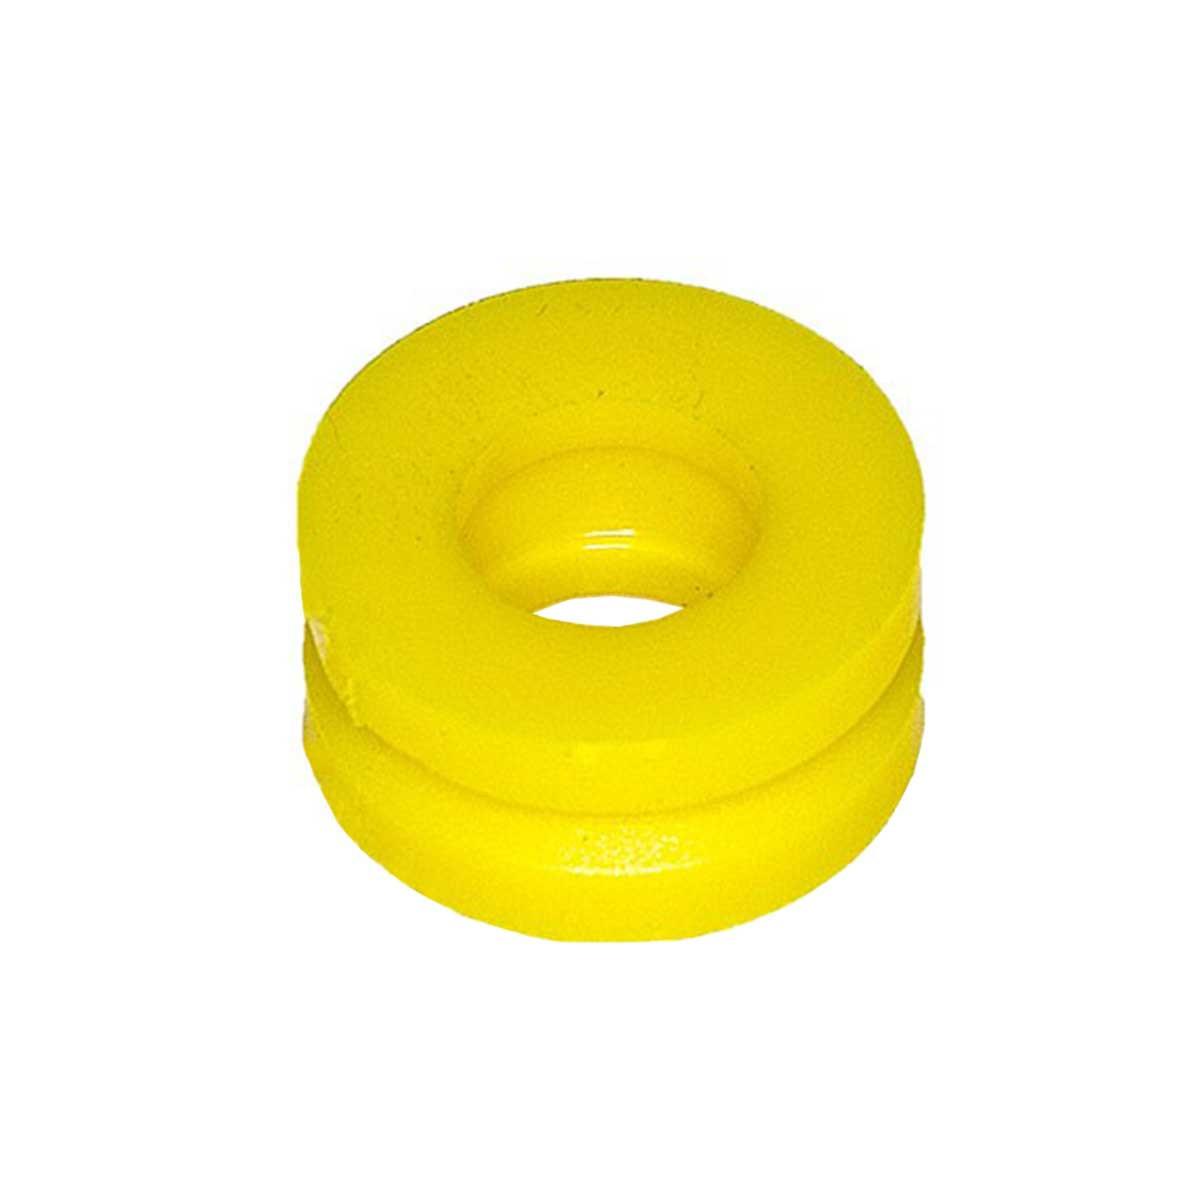 Gemini Taurus II Yellow Groove Grommet